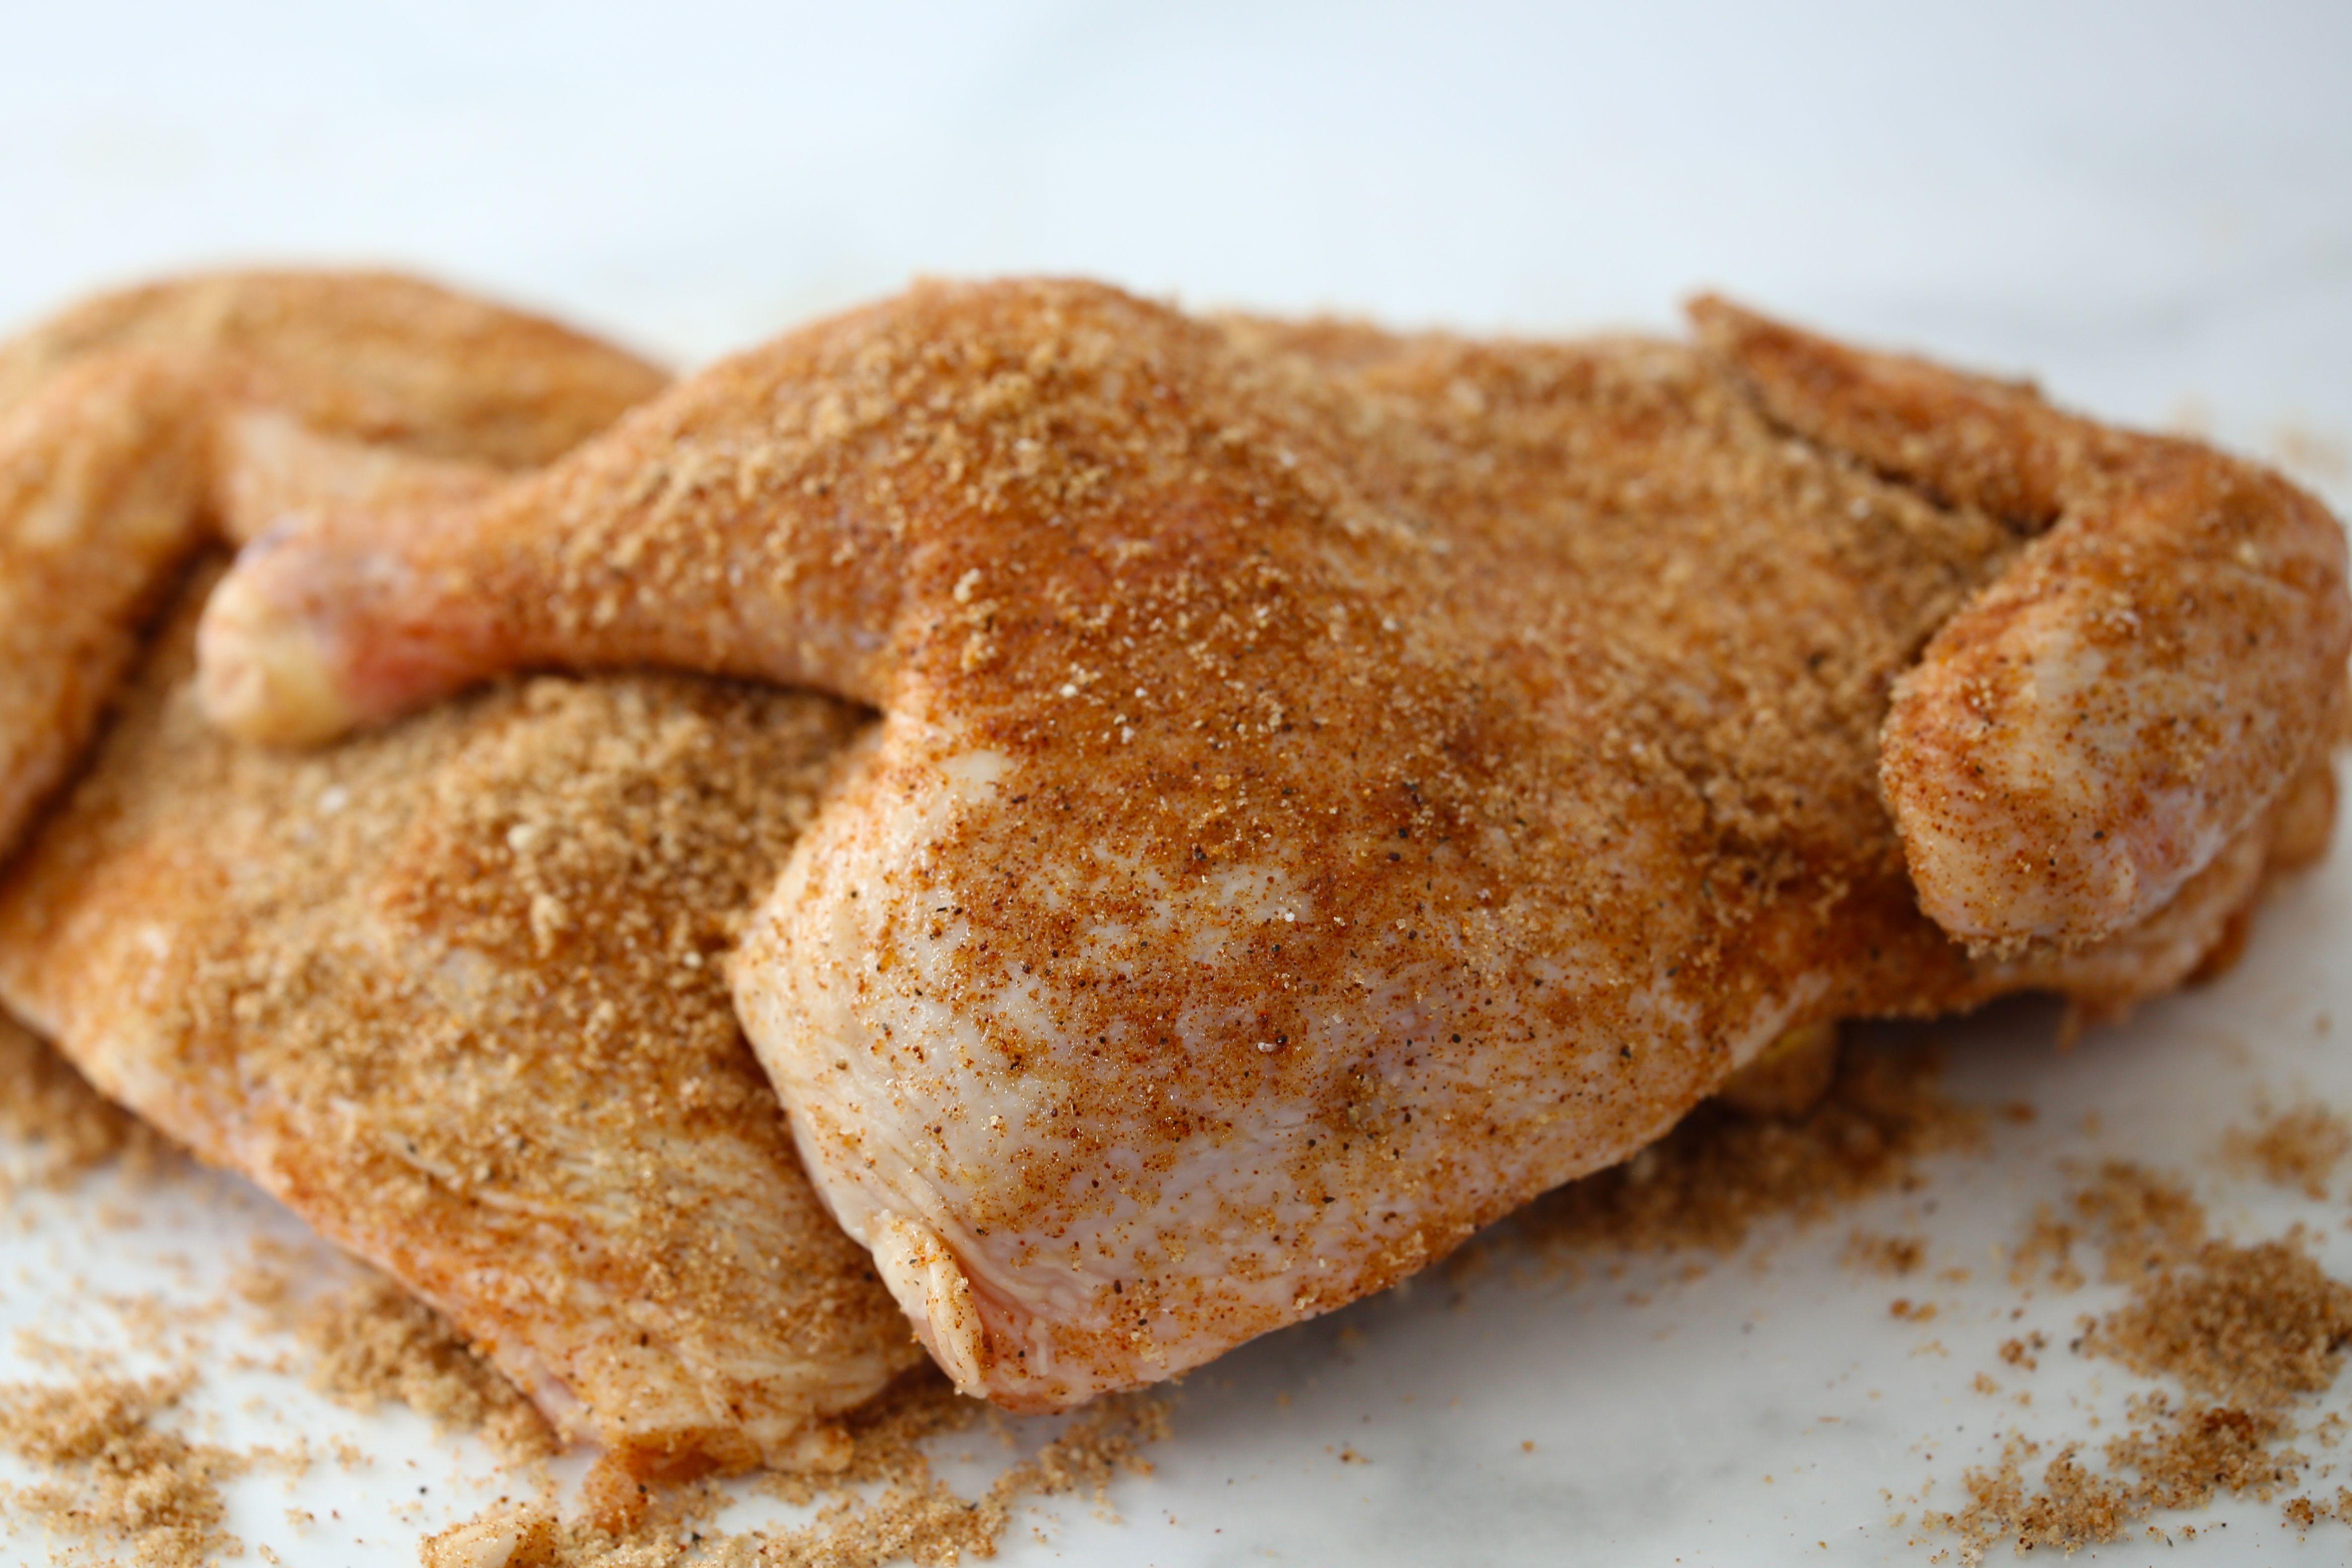 Seasoned chicken pieces for Instant Pot bbq chicken.